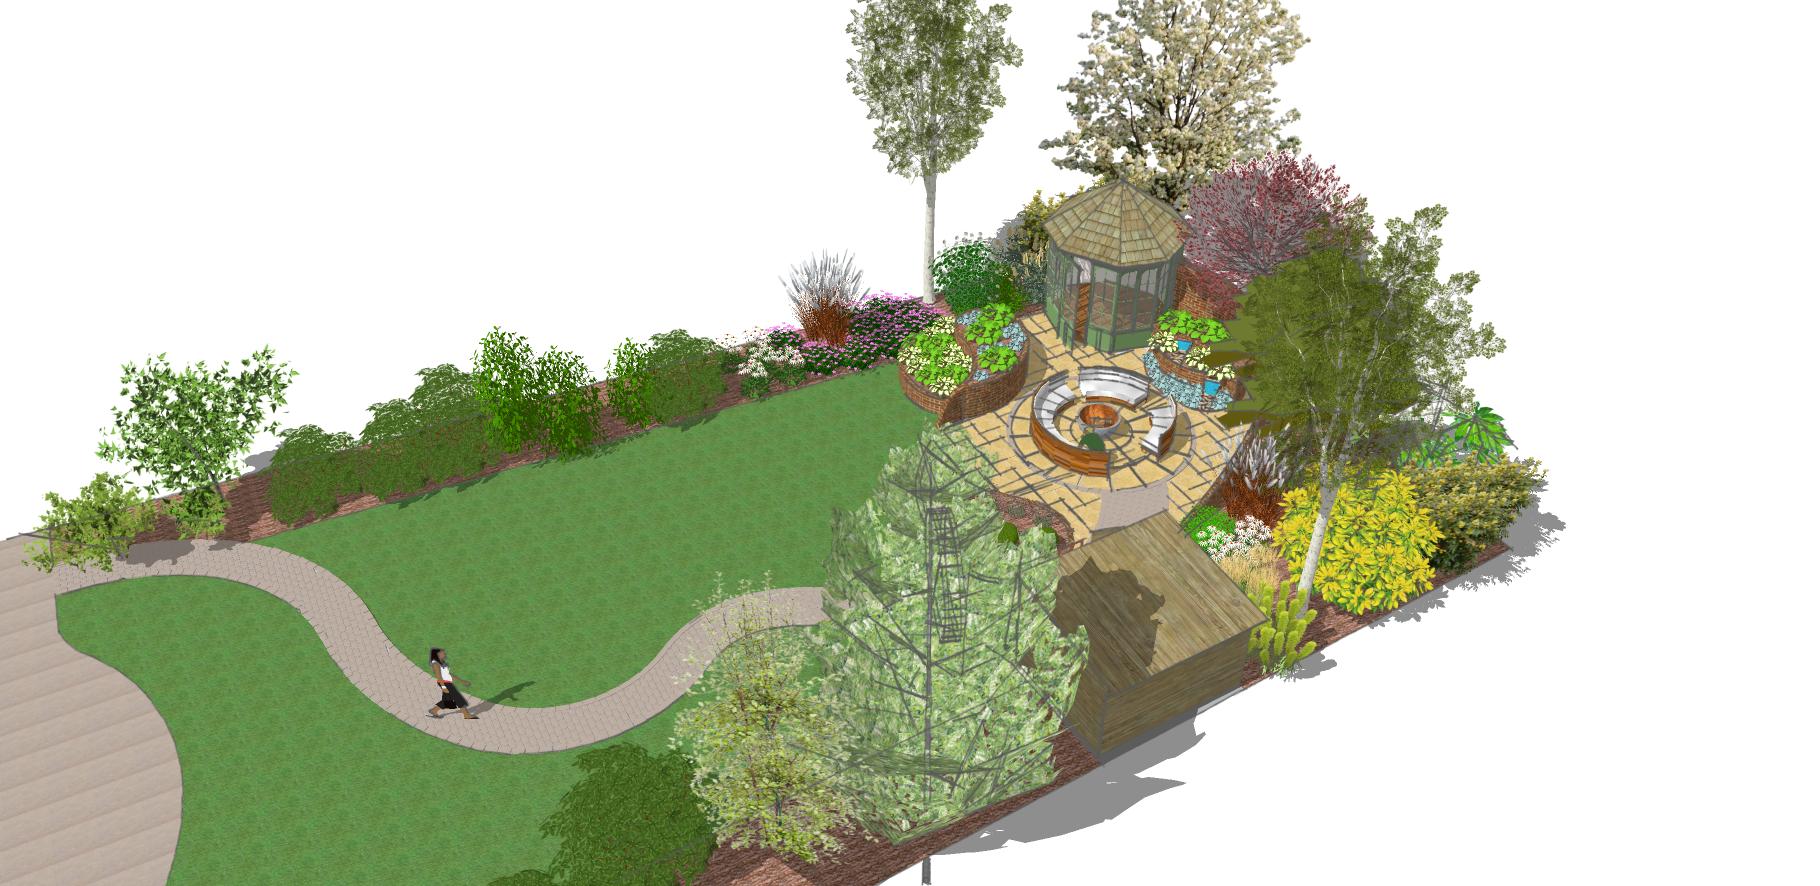 Ed230 visual 1 earth designs garden design and build for Garden design visualiser